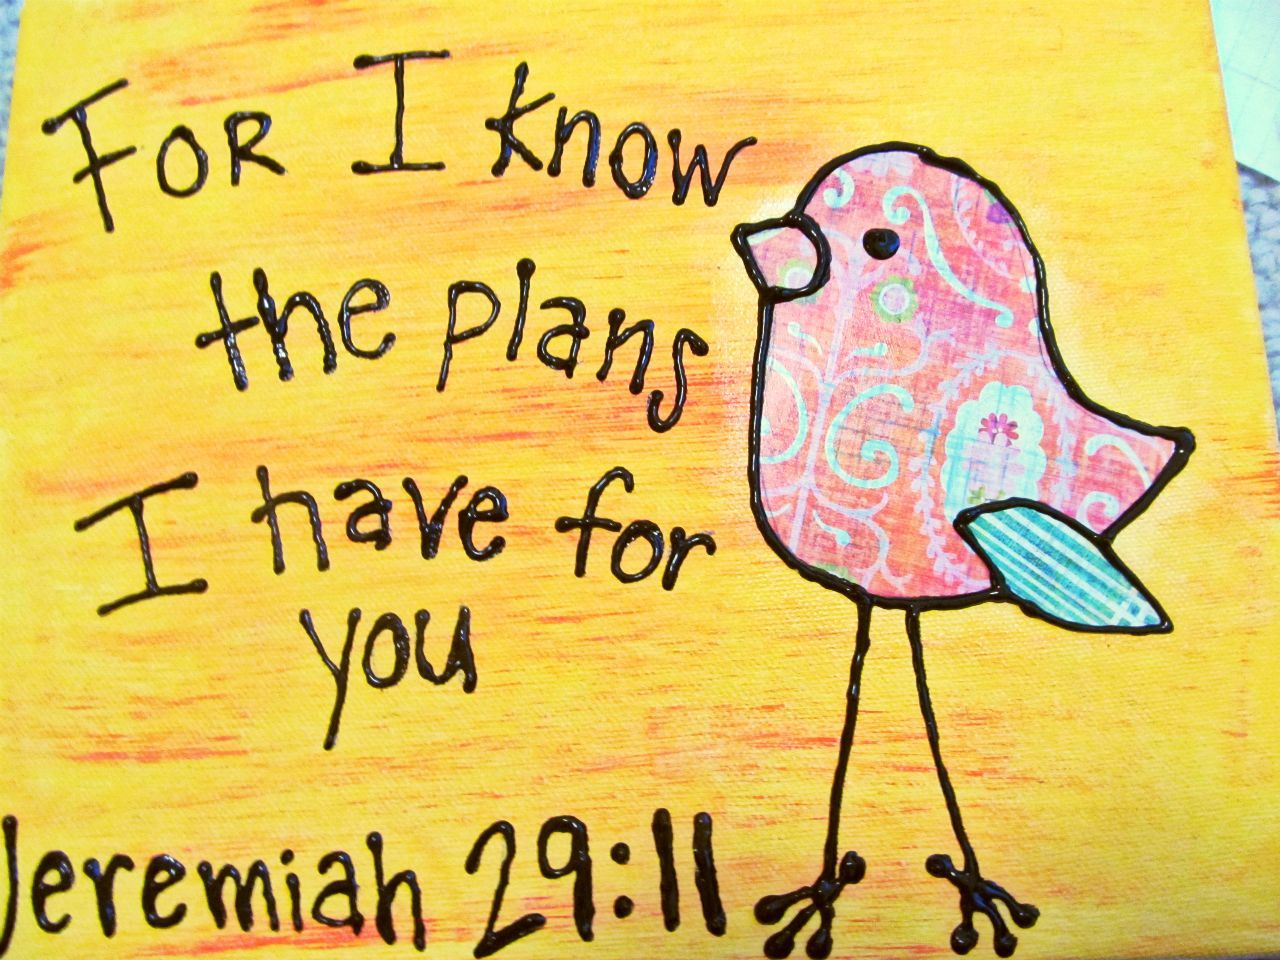 DIY Jeremiah 29:11 Painting